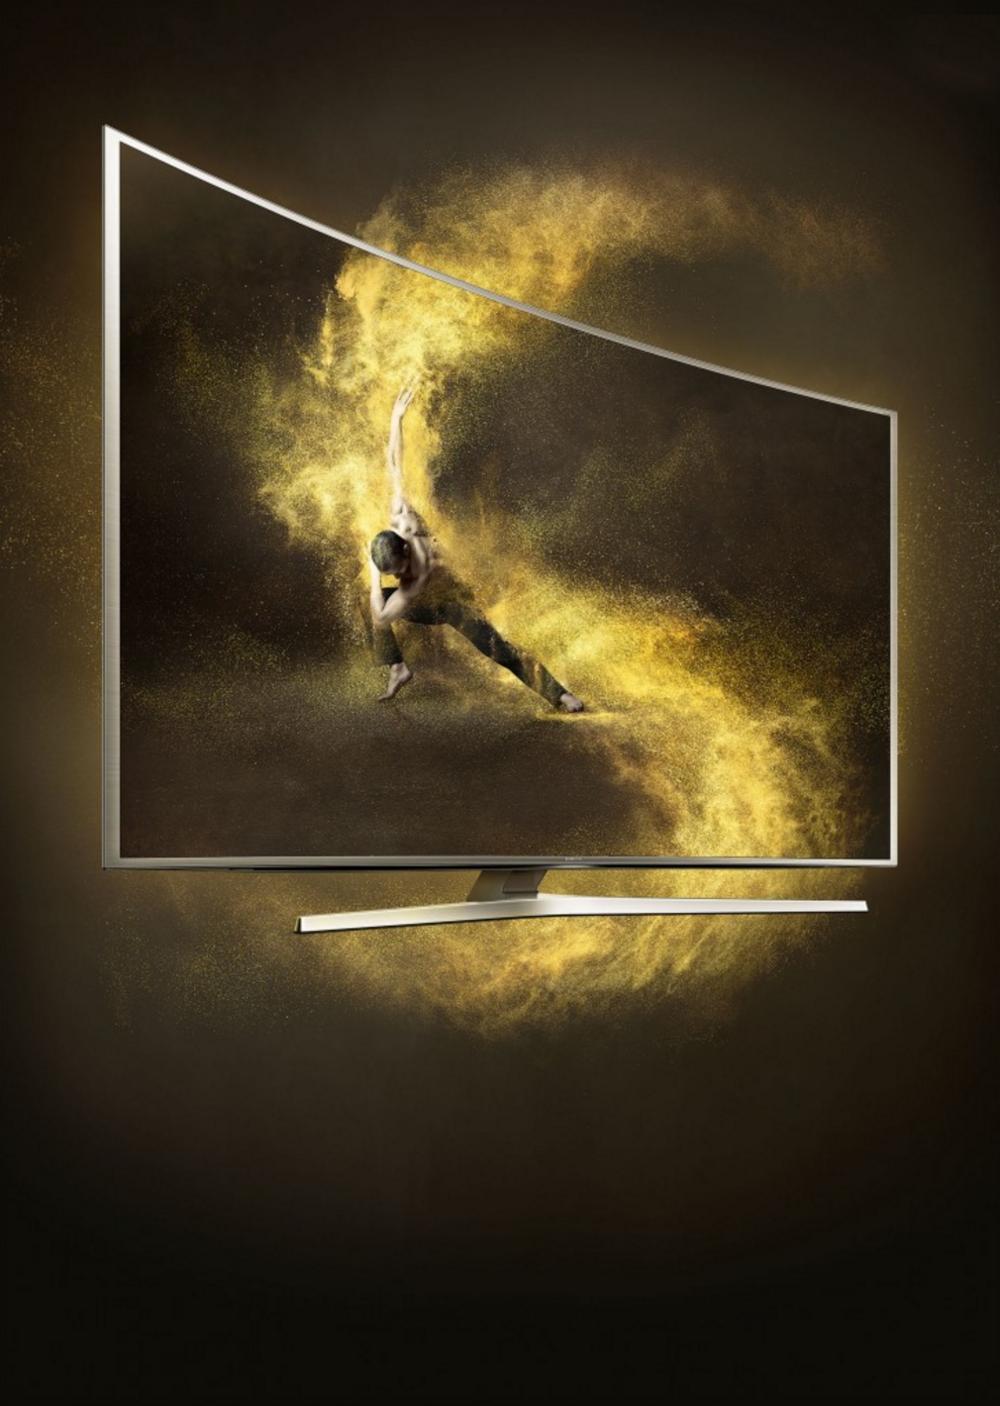 Samsung TV Dynamic – Gold Dust